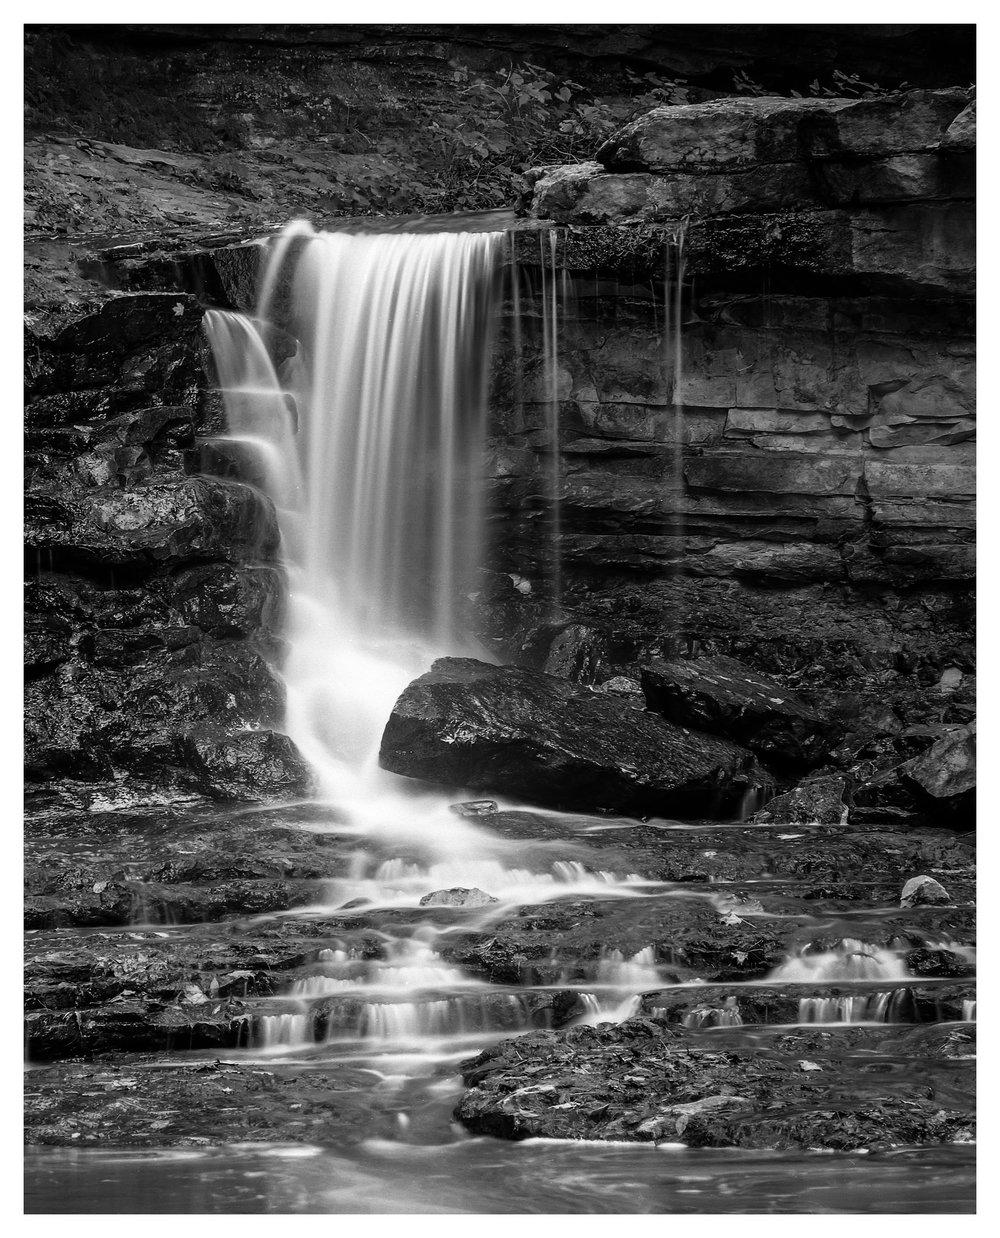 McCormick Falls - Mamiya RB67 ProS with ACROS 100 film, long exposure